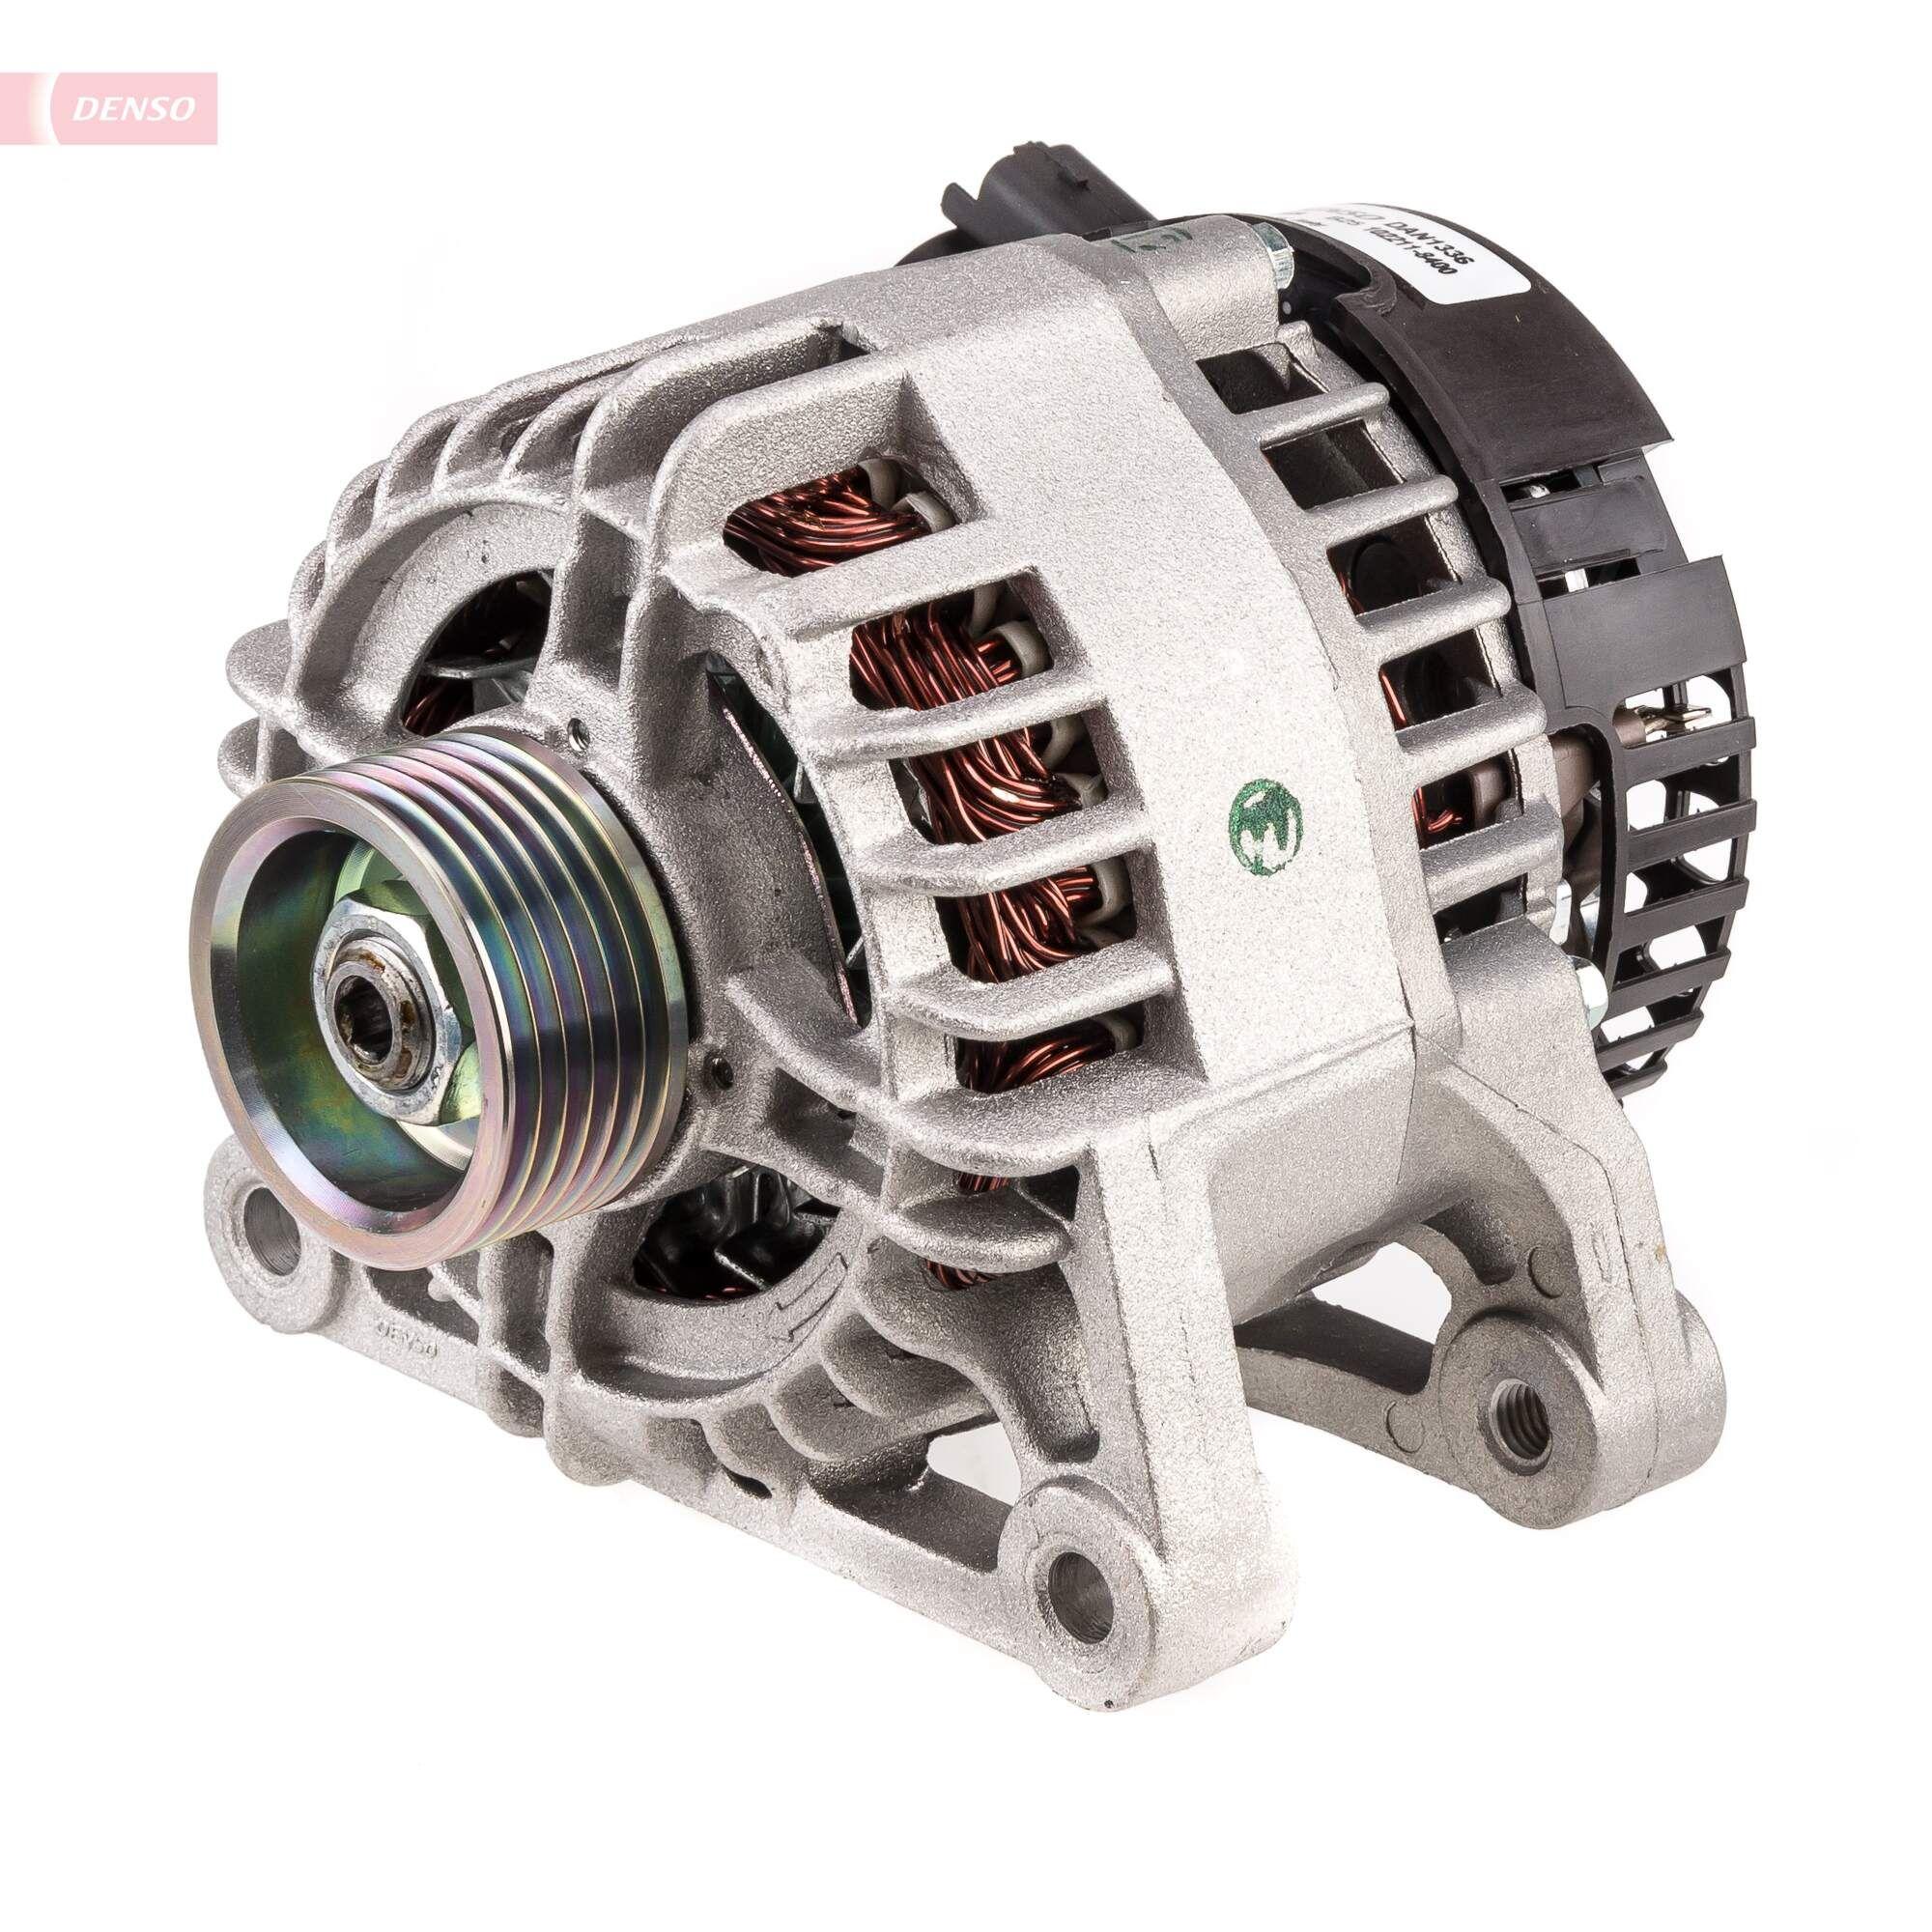 Generador DAN1336 DENSO DAN1336 en calidad original